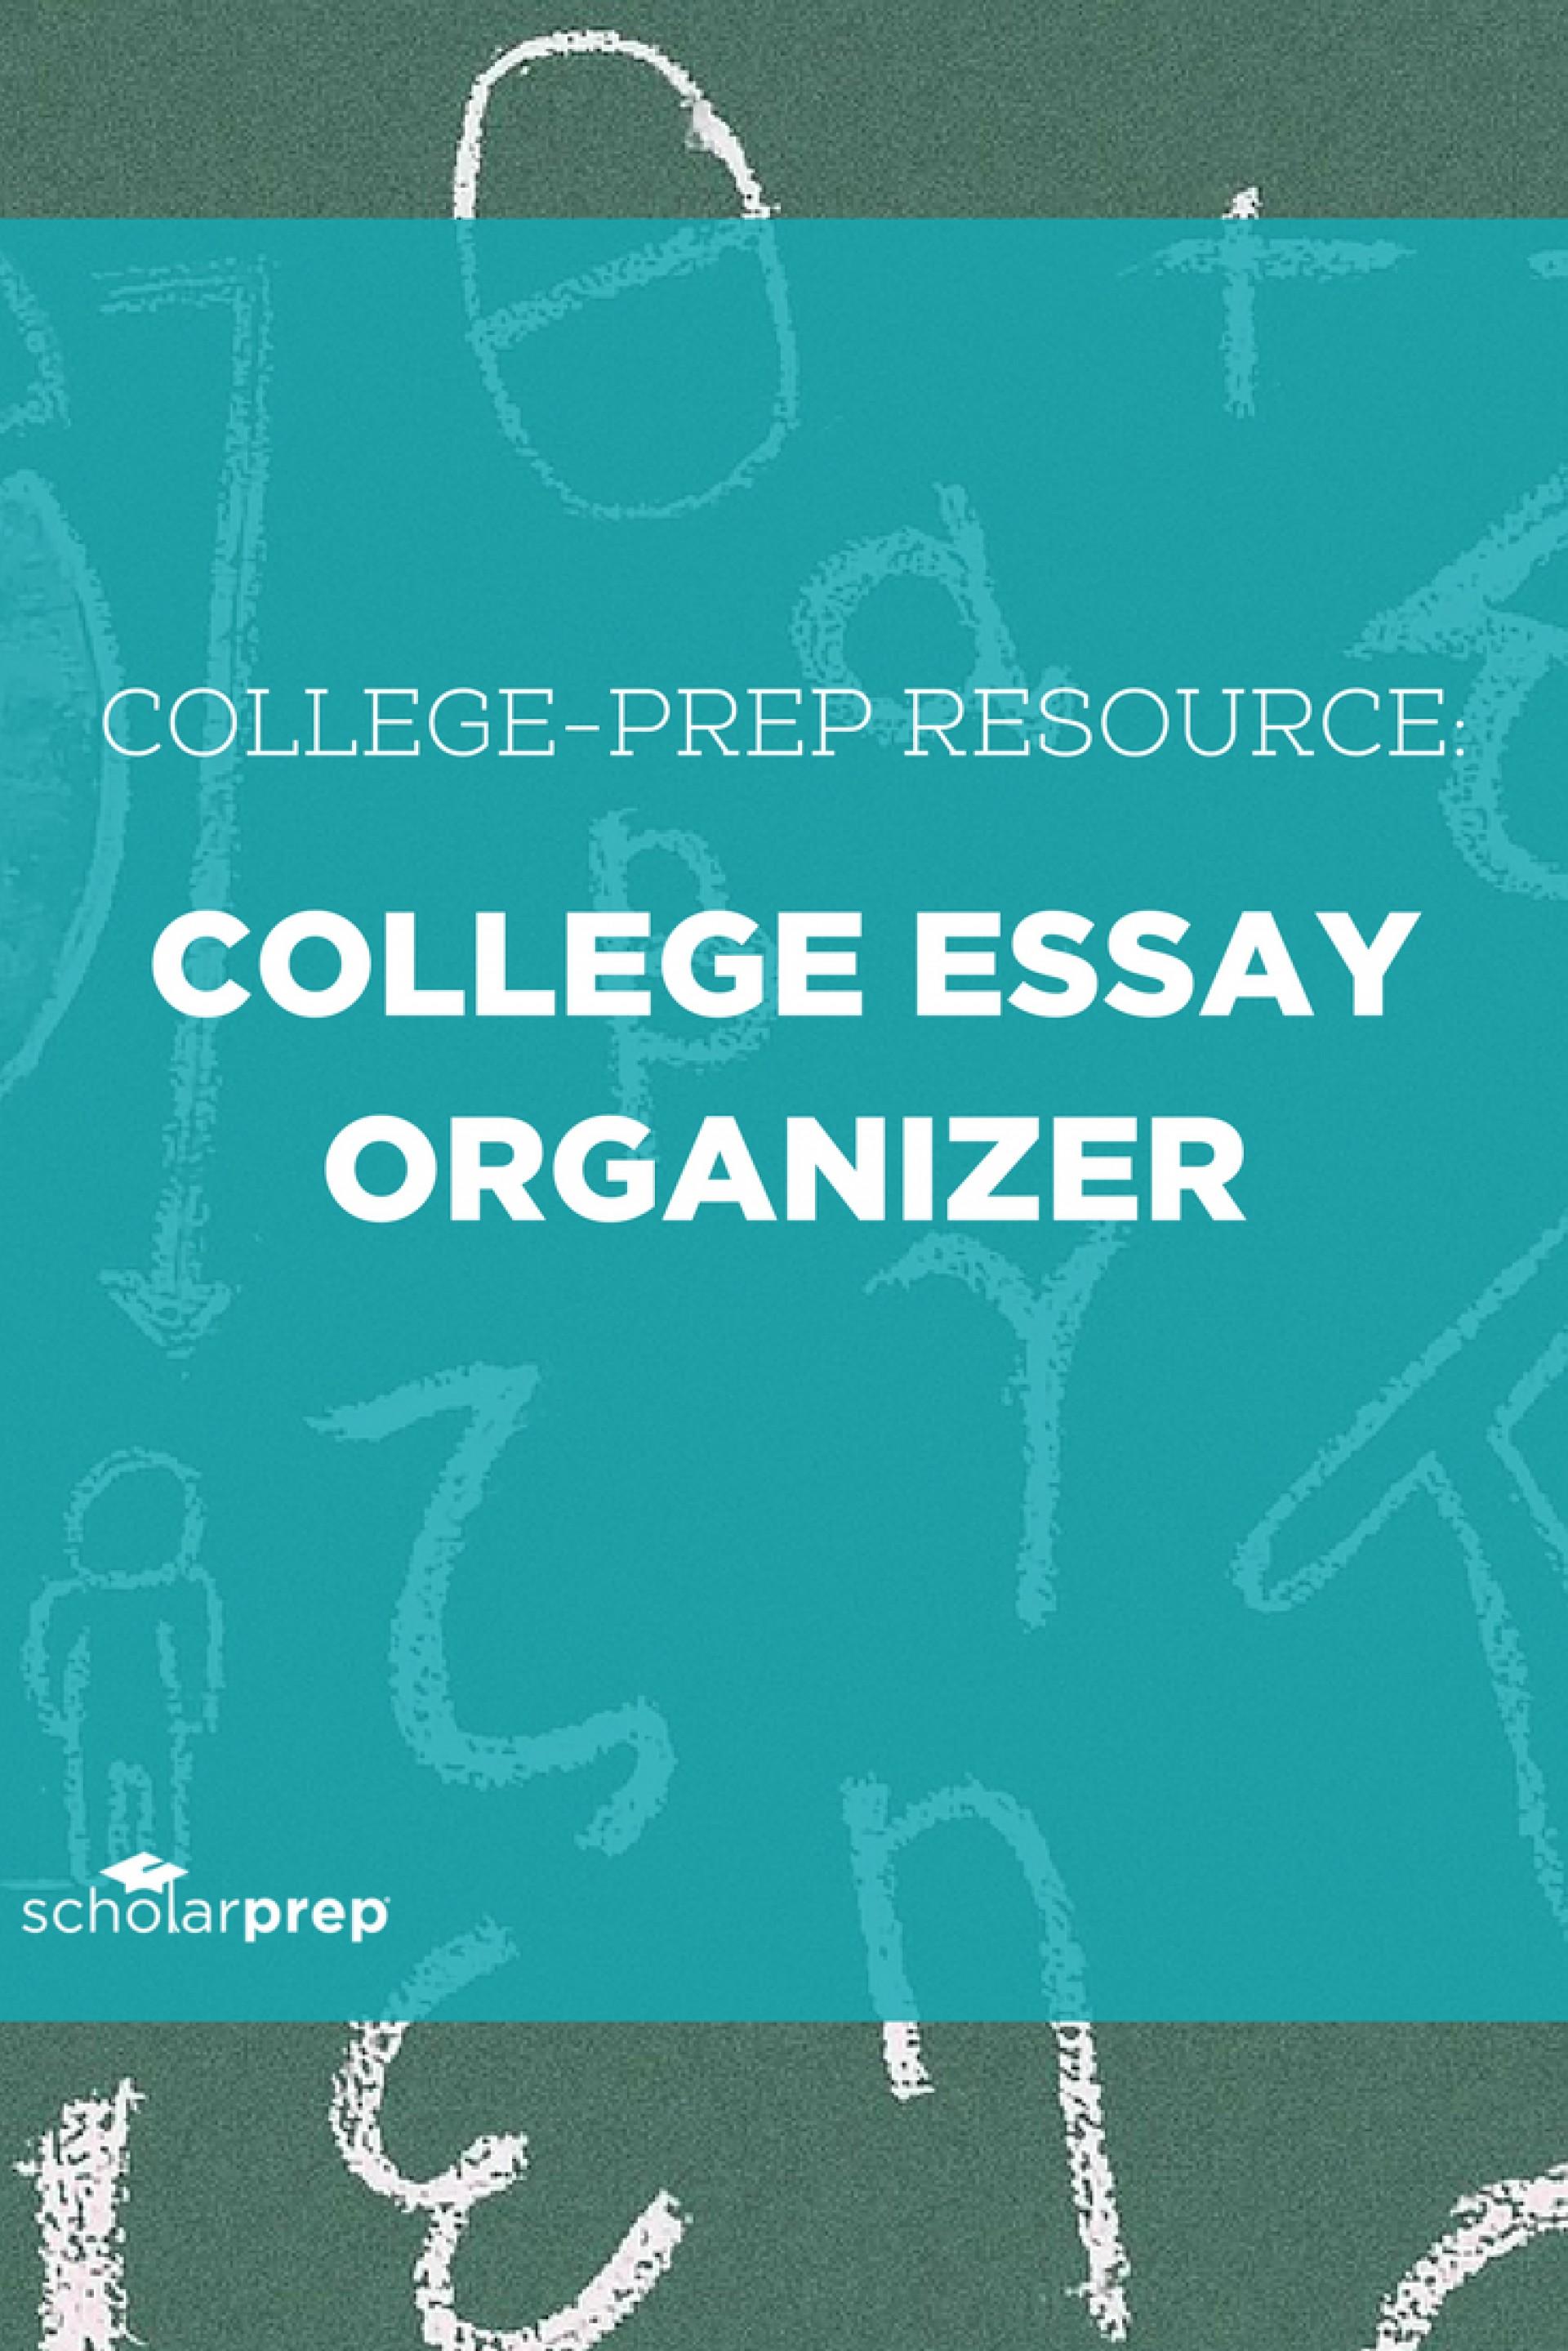 015 College Essay Organizer Prep Resource Surprising Application Graphic Organizers Argumentative 1920